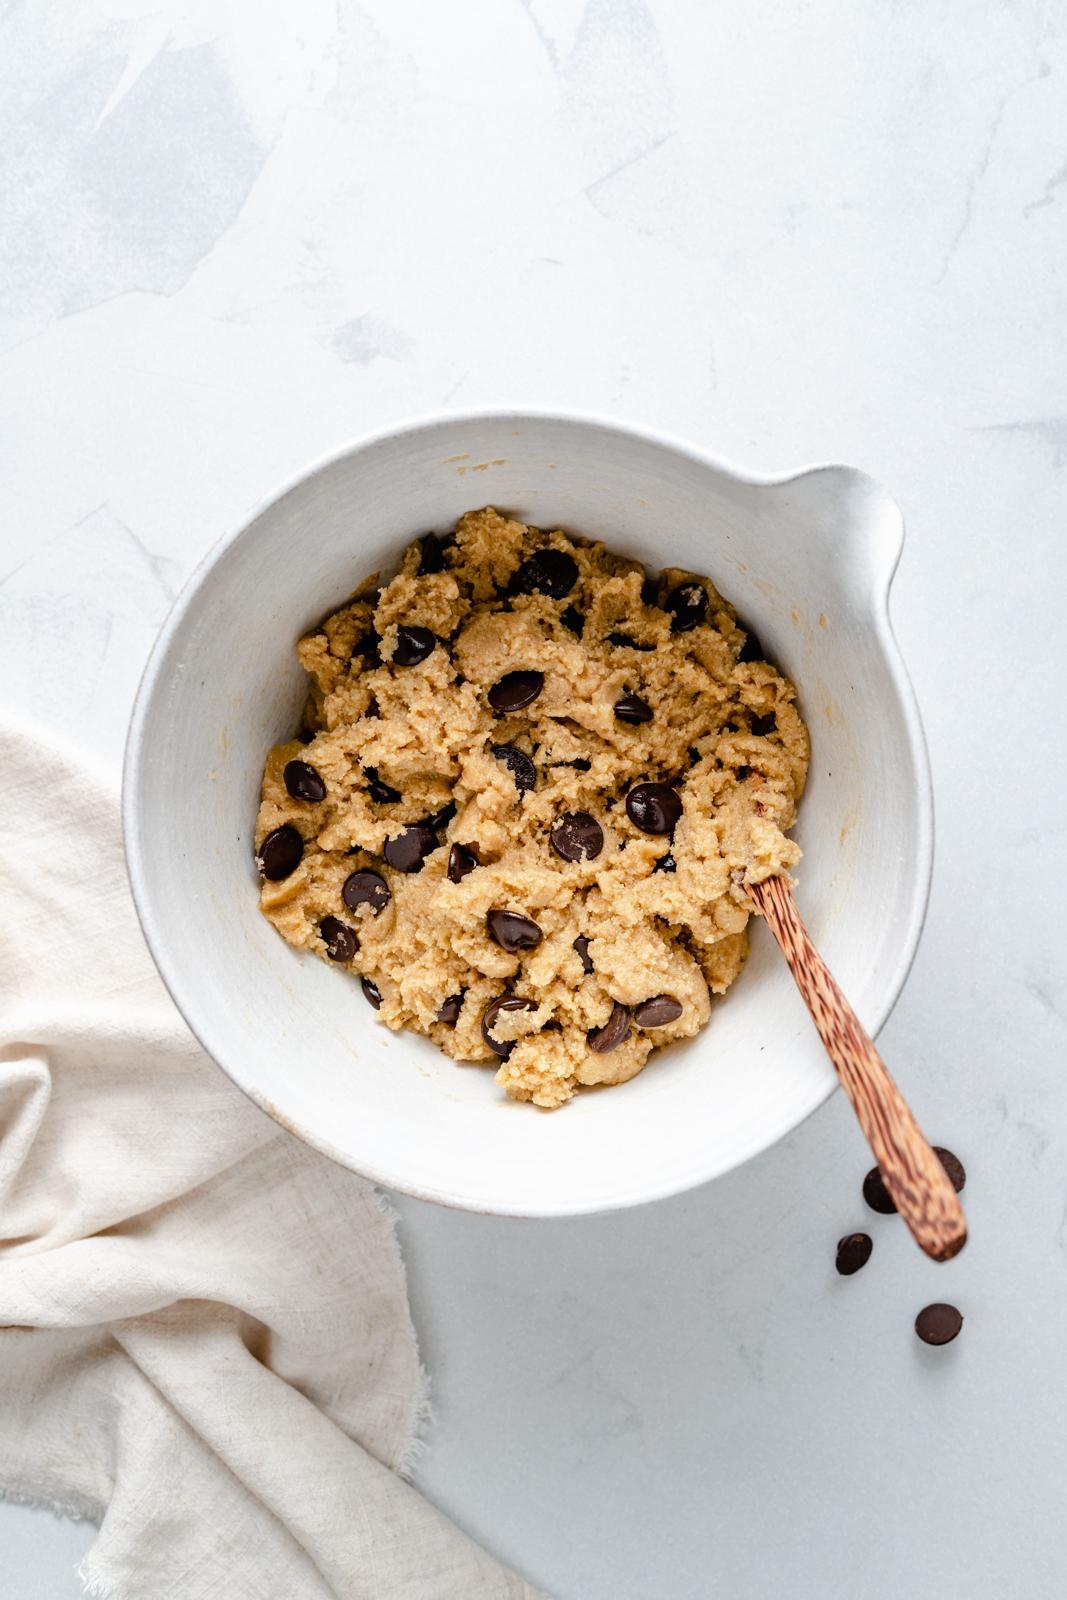 grain free almond flour chocolate chip cookie dough in a bowl